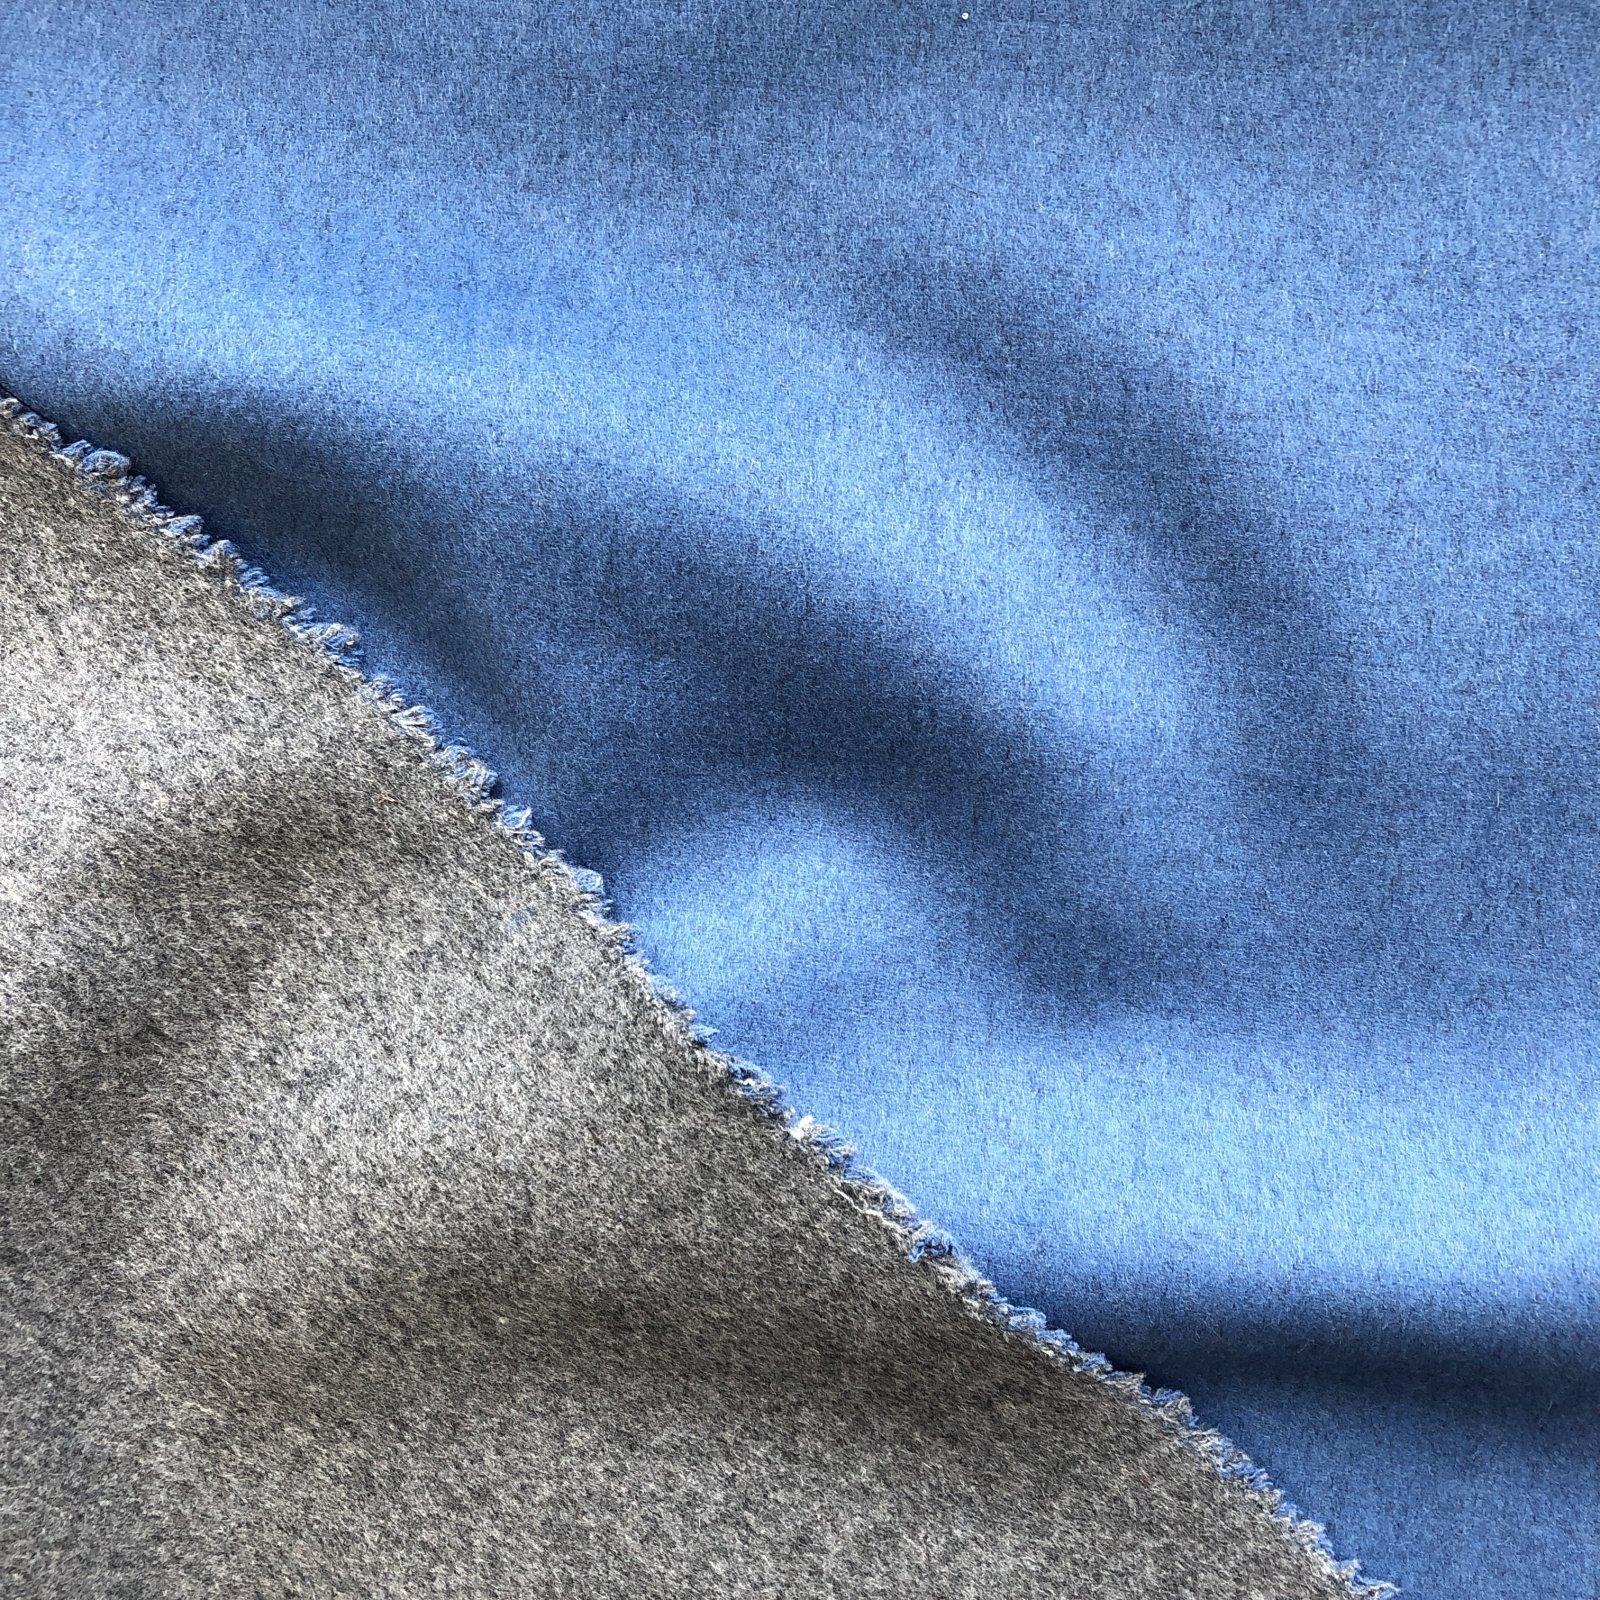 Designer Wool Coating - Double Faced Sky Blue/Ash